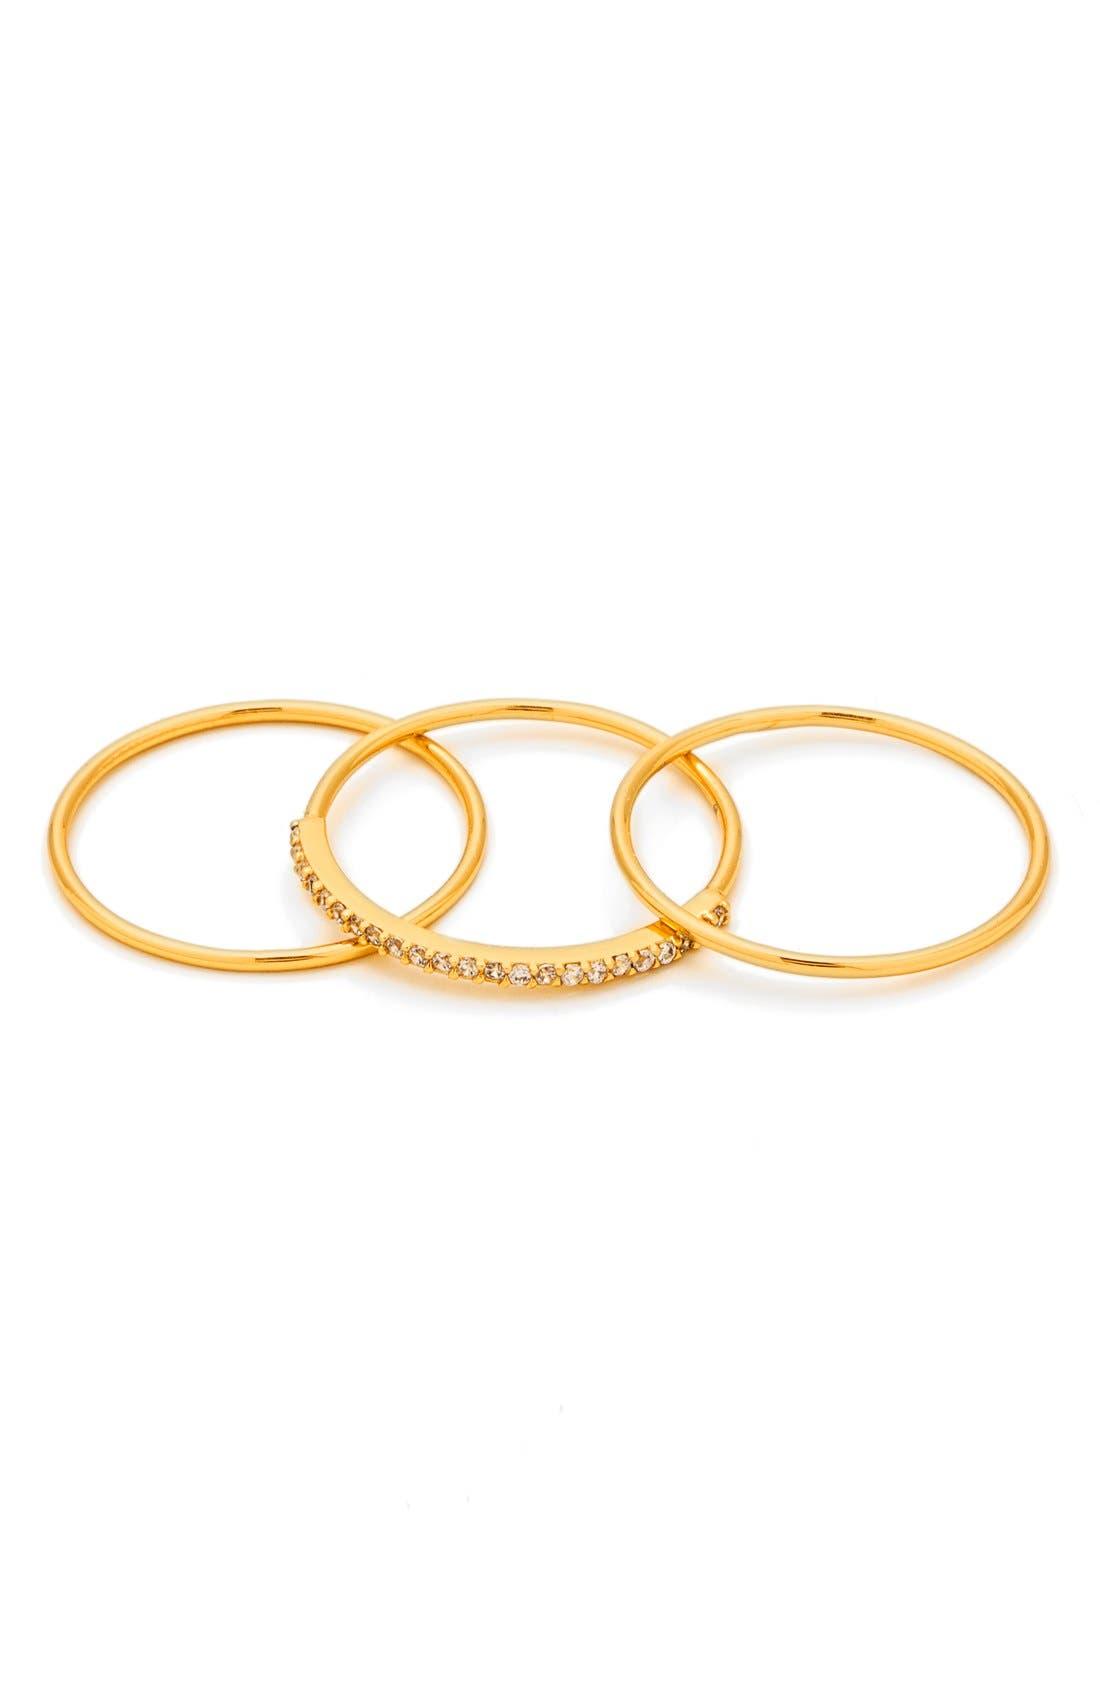 Shimmer Stackable Set of 3 Band Rings,                             Main thumbnail 1, color,